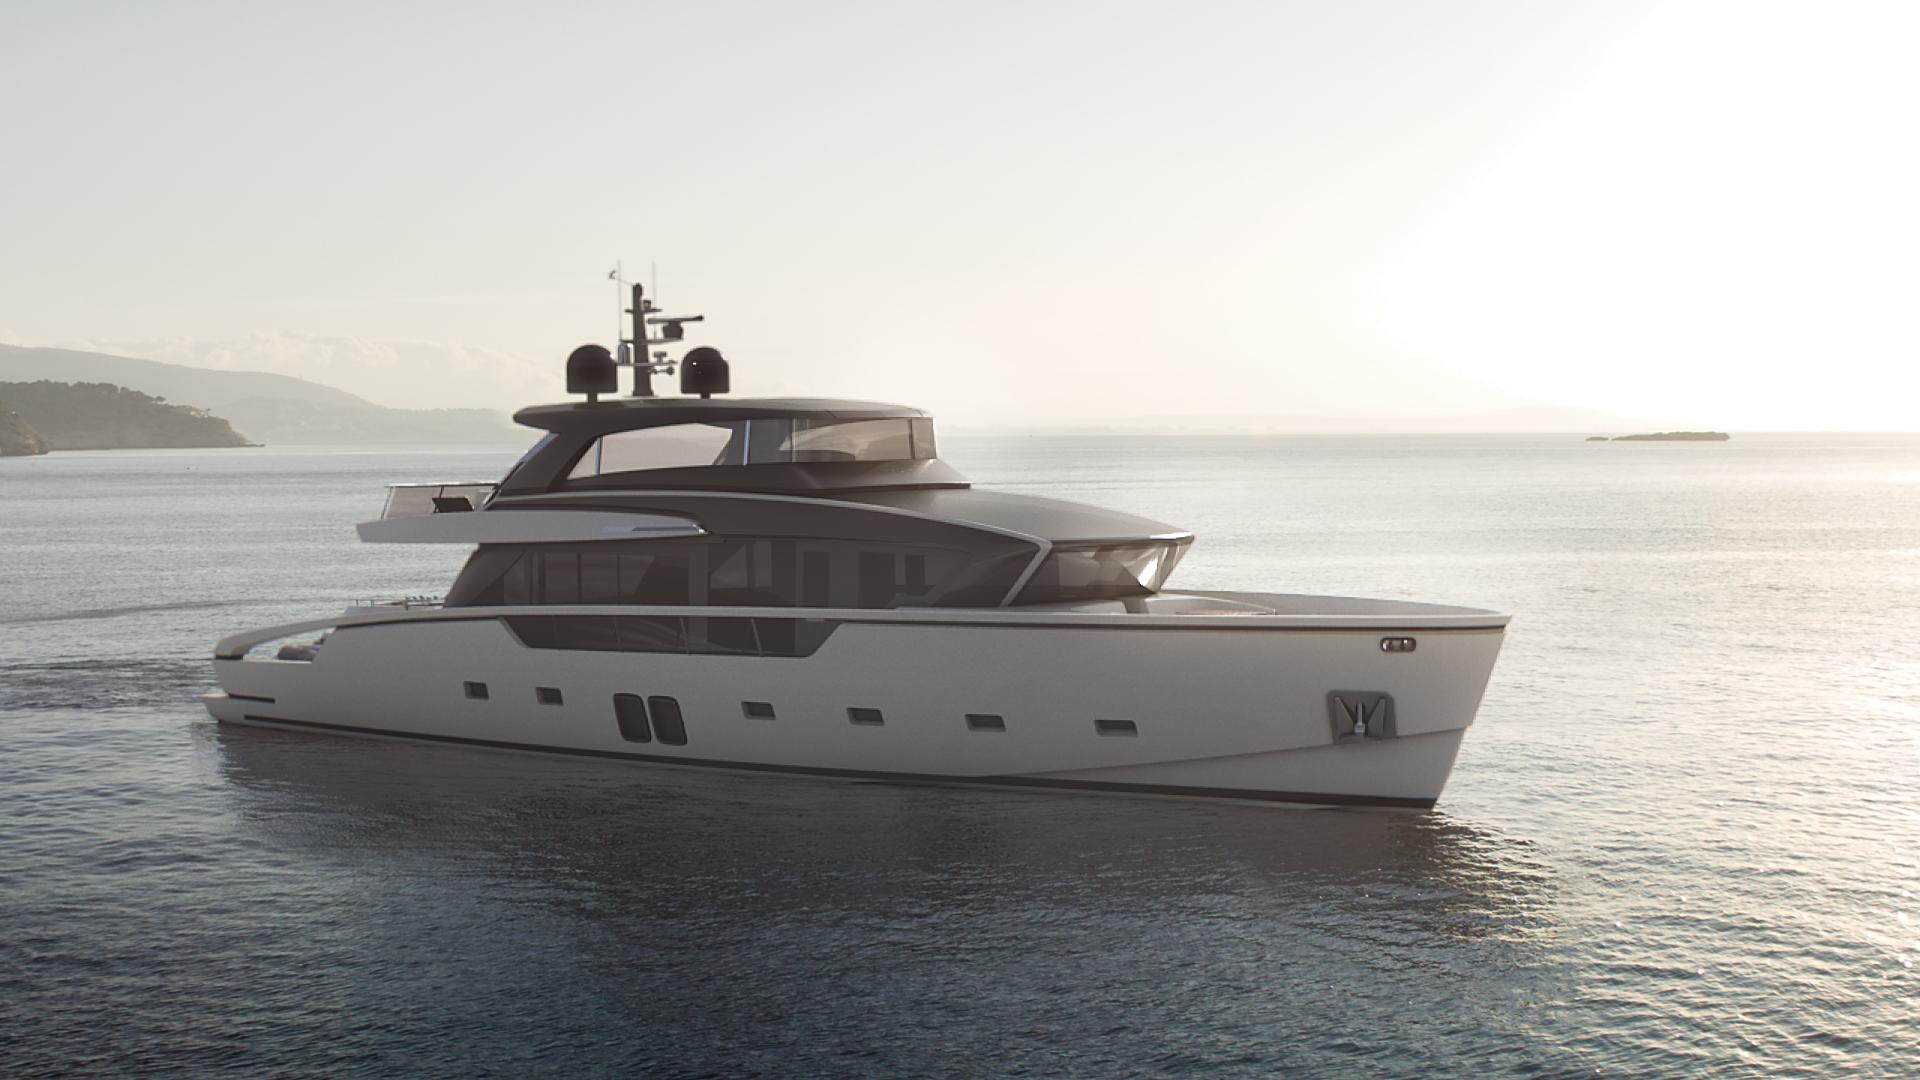 Luxury yacht SX88 - Built by Sanlorenzo